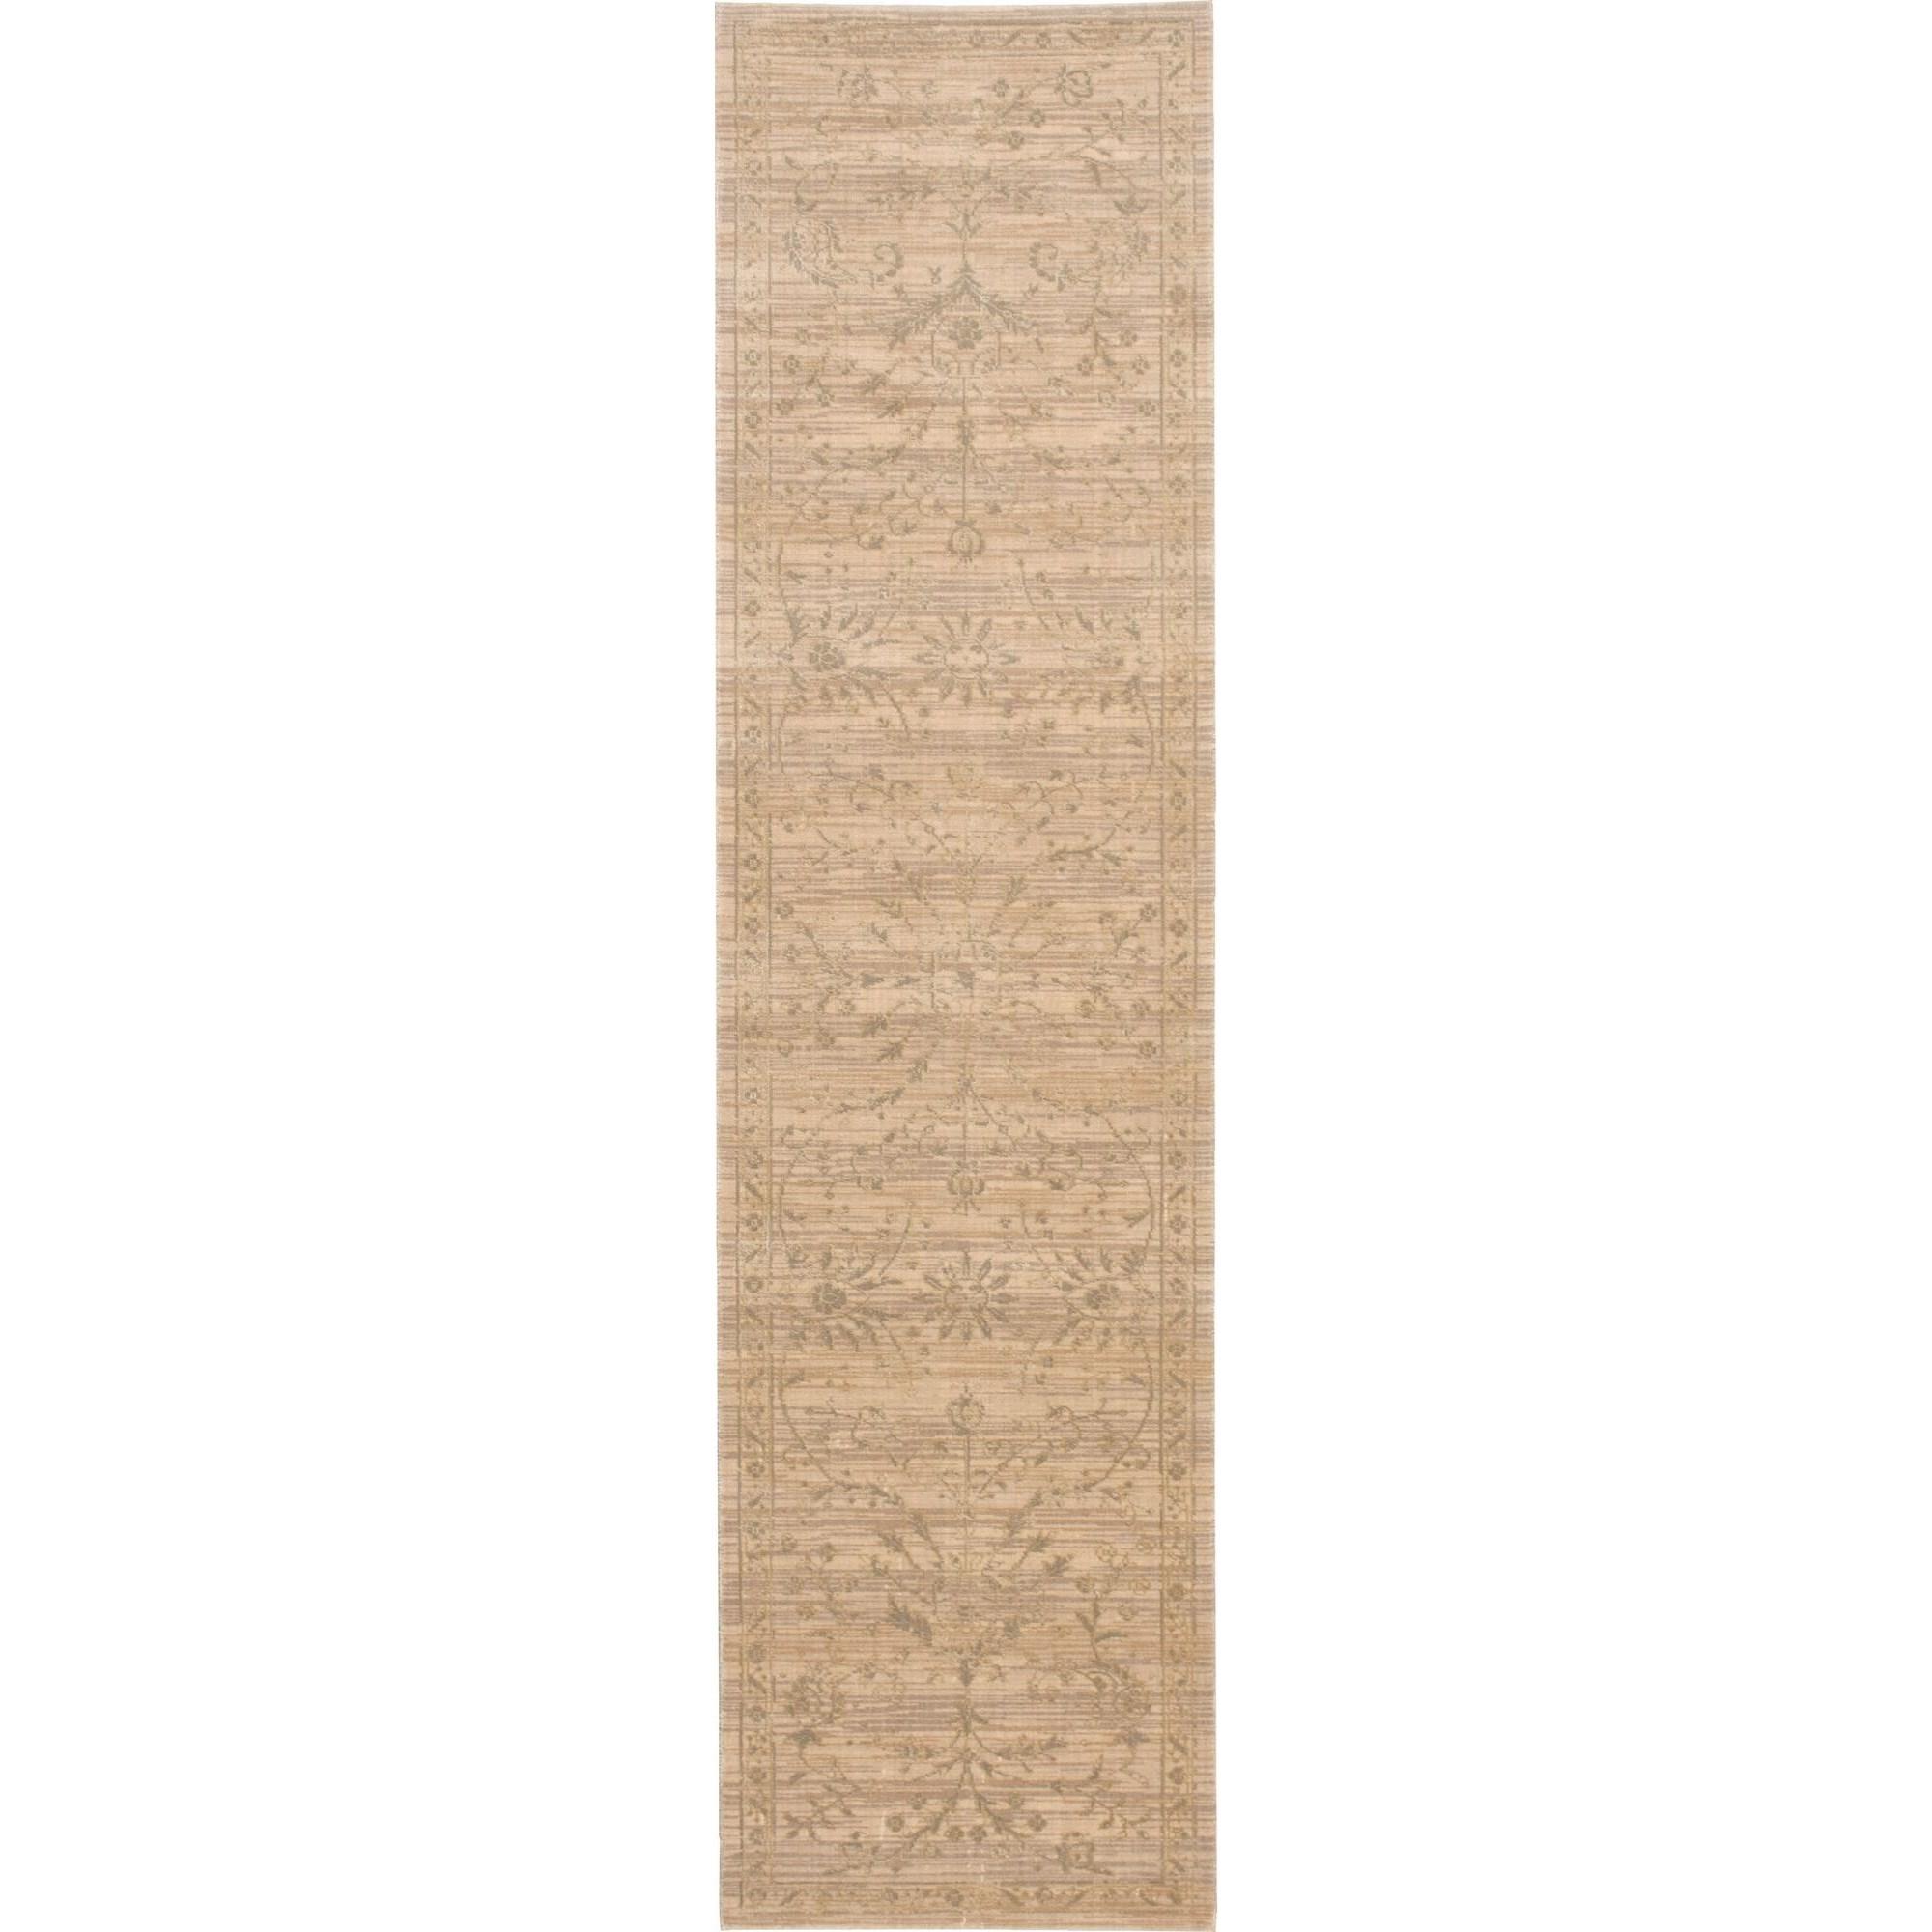 "Nourison Silk Elements 2'5"" x 10' Sand Area Rug - Item Number: 18873"